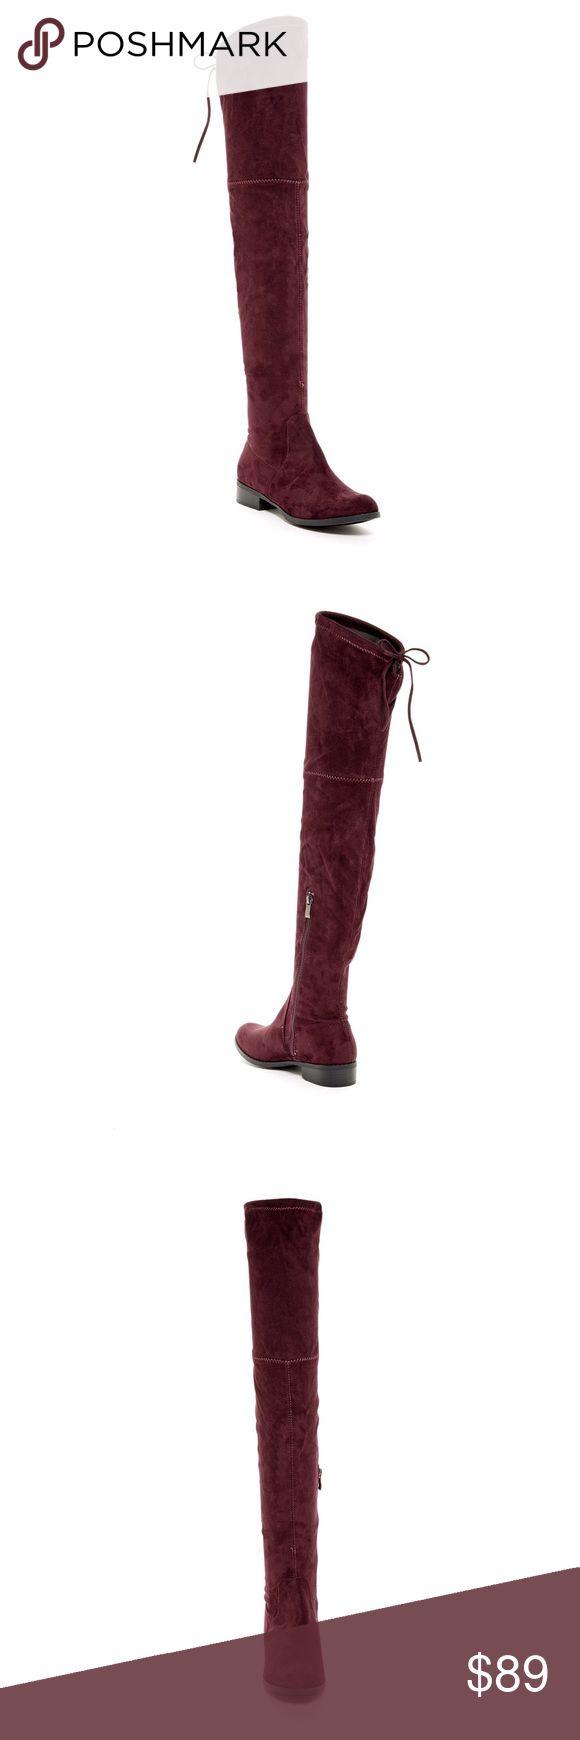 Catherine Malandrino Burgundy over the knee boots Catherine Malandrino Burgundy over the knee boots. Brand new never worn. Size 9 Catherine Malandrino Shoes Over the Knee Boots